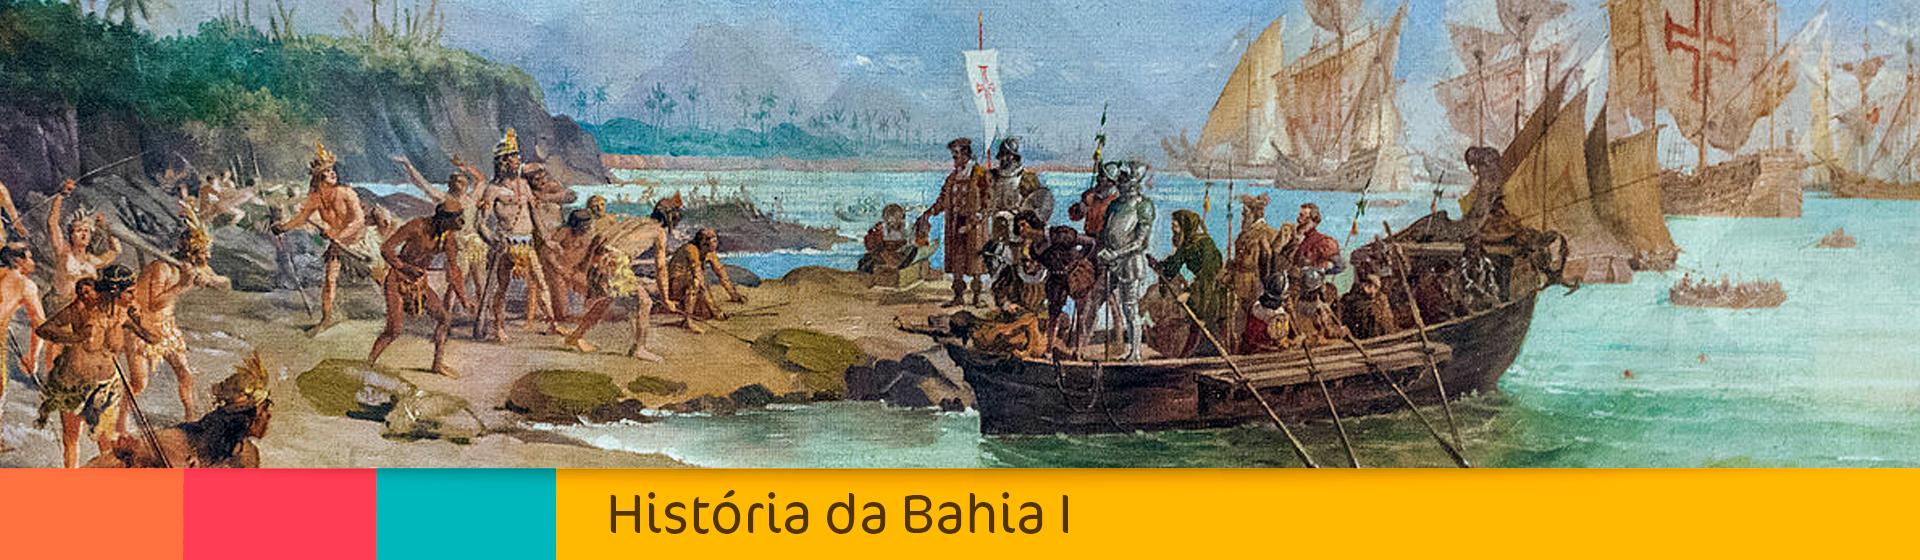 Historia bahia i 2